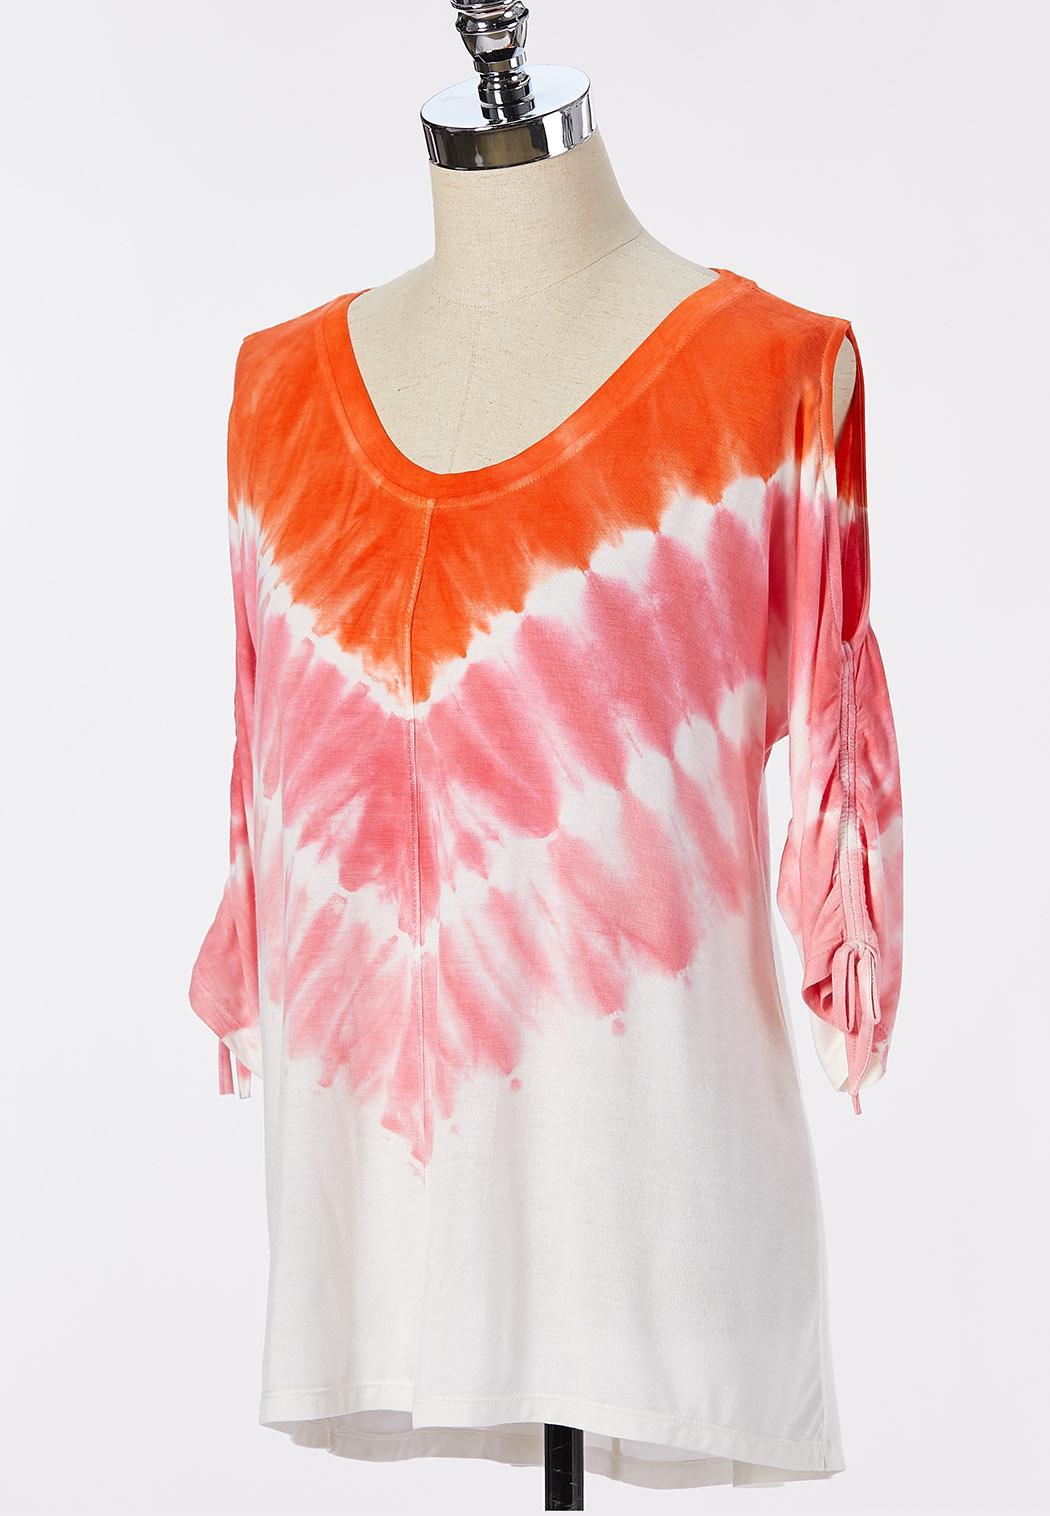 Plus Size Sunset Tie Dye Top